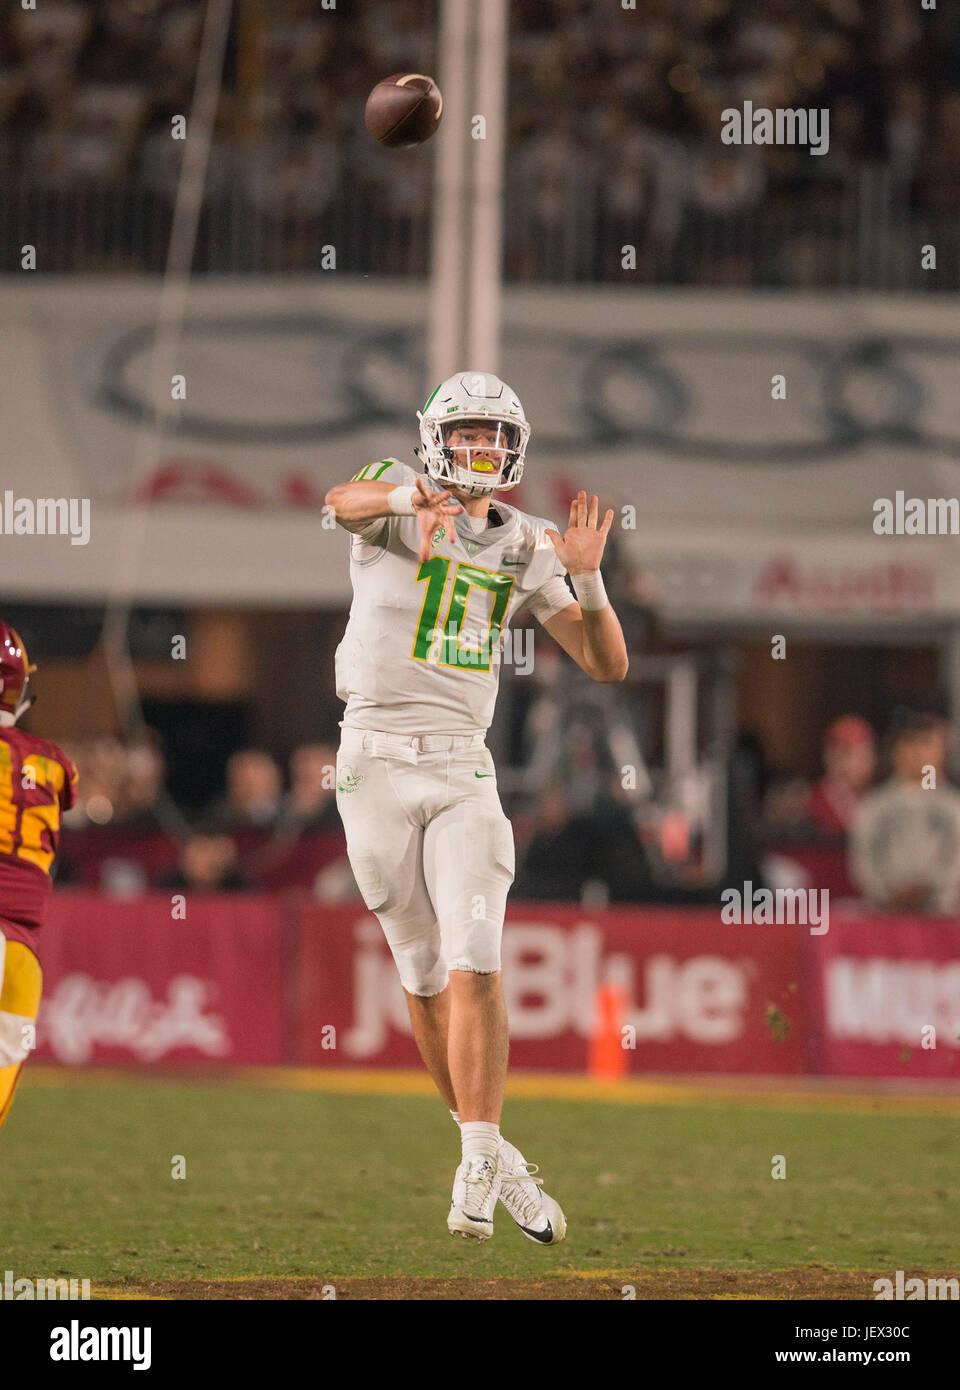 Los Angeles Ca Usa 05th Nov 2016 Oregon Ducks Freshman Stock Photo Alamy